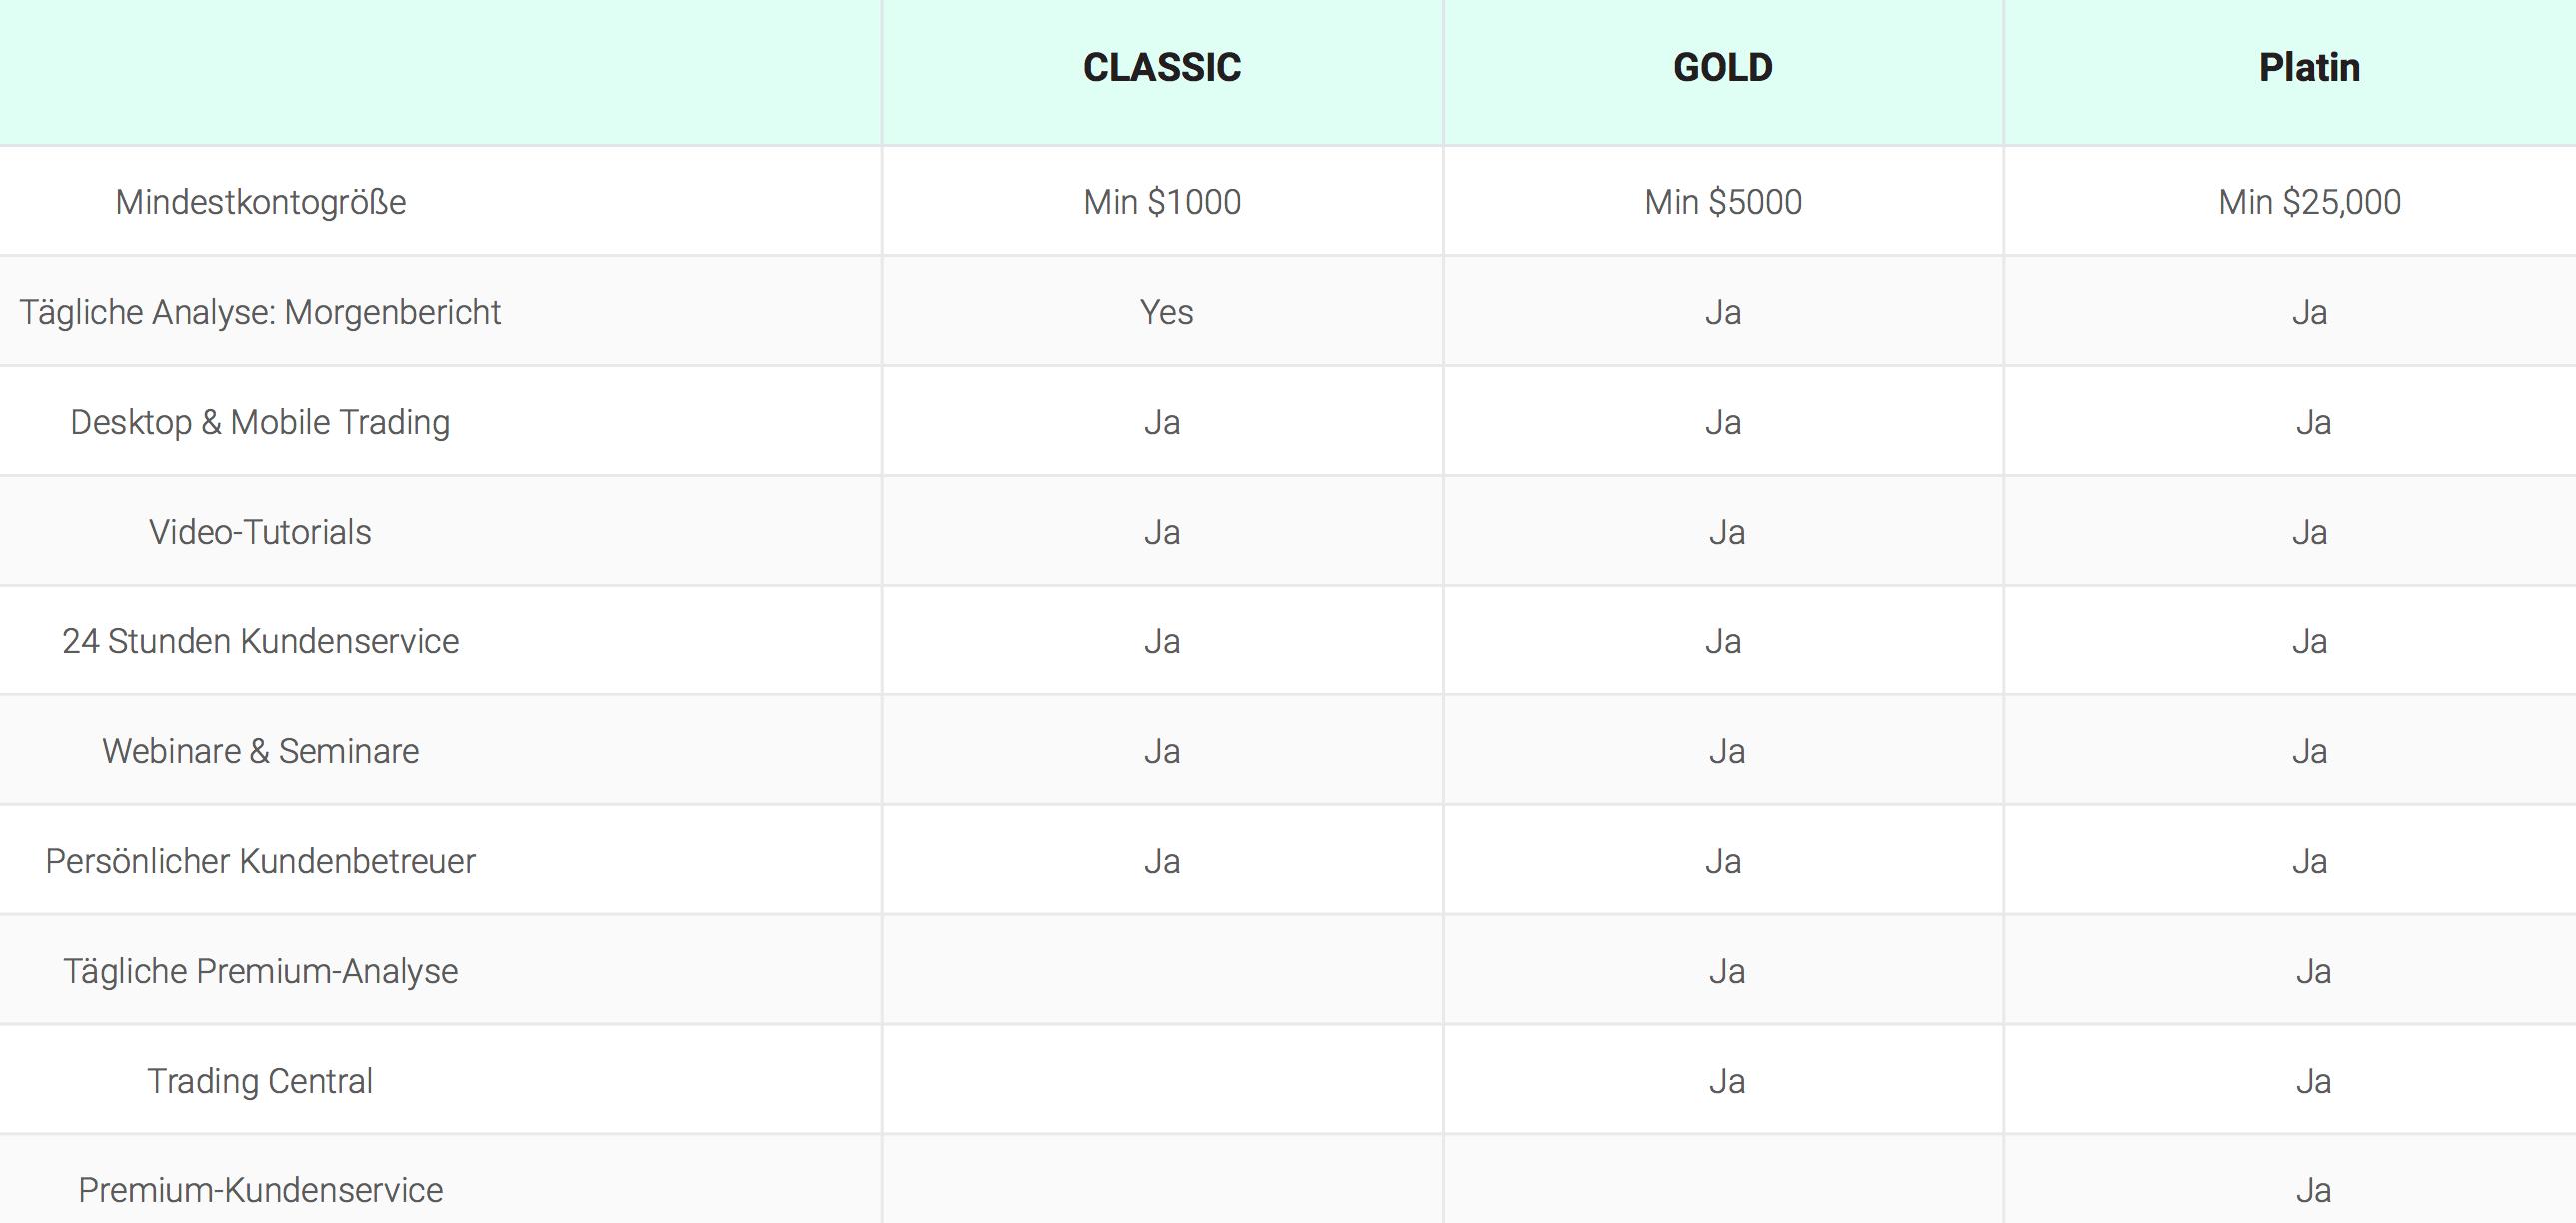 Trade.com stellt verschiedene Kontenarten zur Verfügung